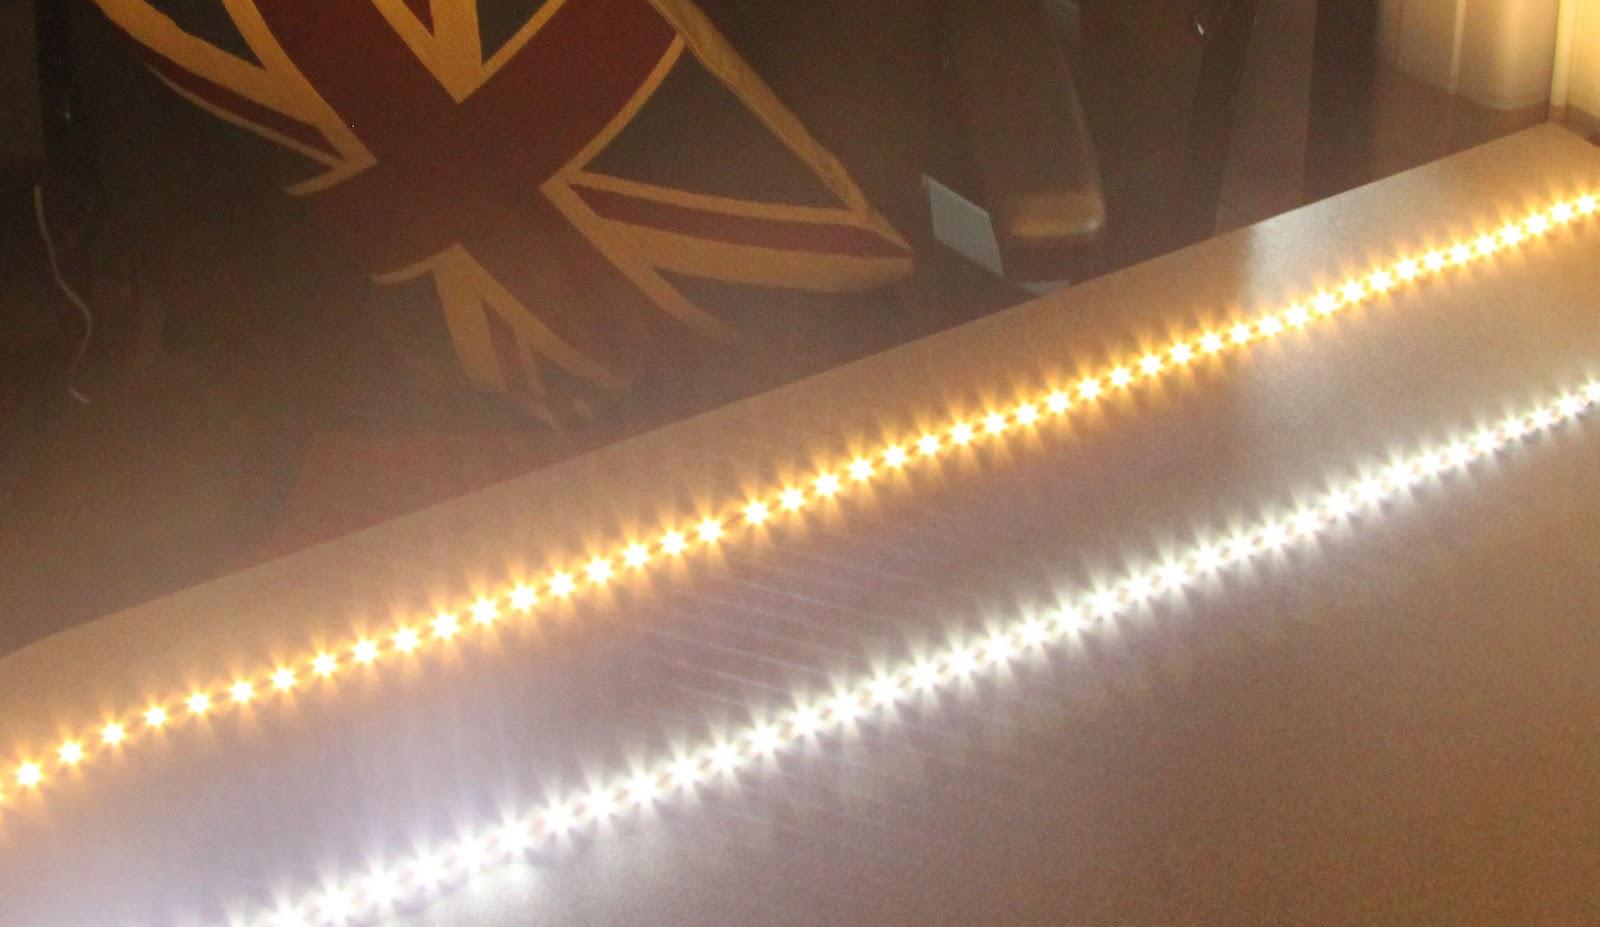 Motorhome Adhesive LED Lighting Strips